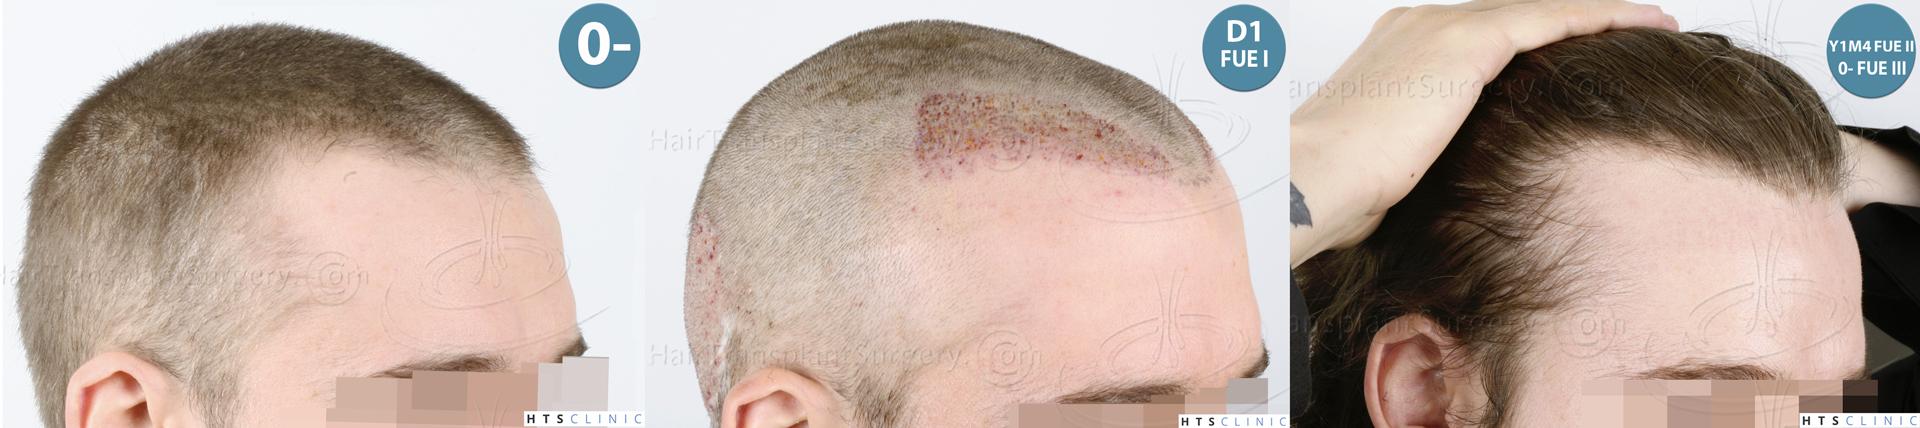 Dr.Devroye-HTS-Clinic-6132-_2011_1232_2889_-FUE-Barbe-et-cheveux-Montage5.jpg